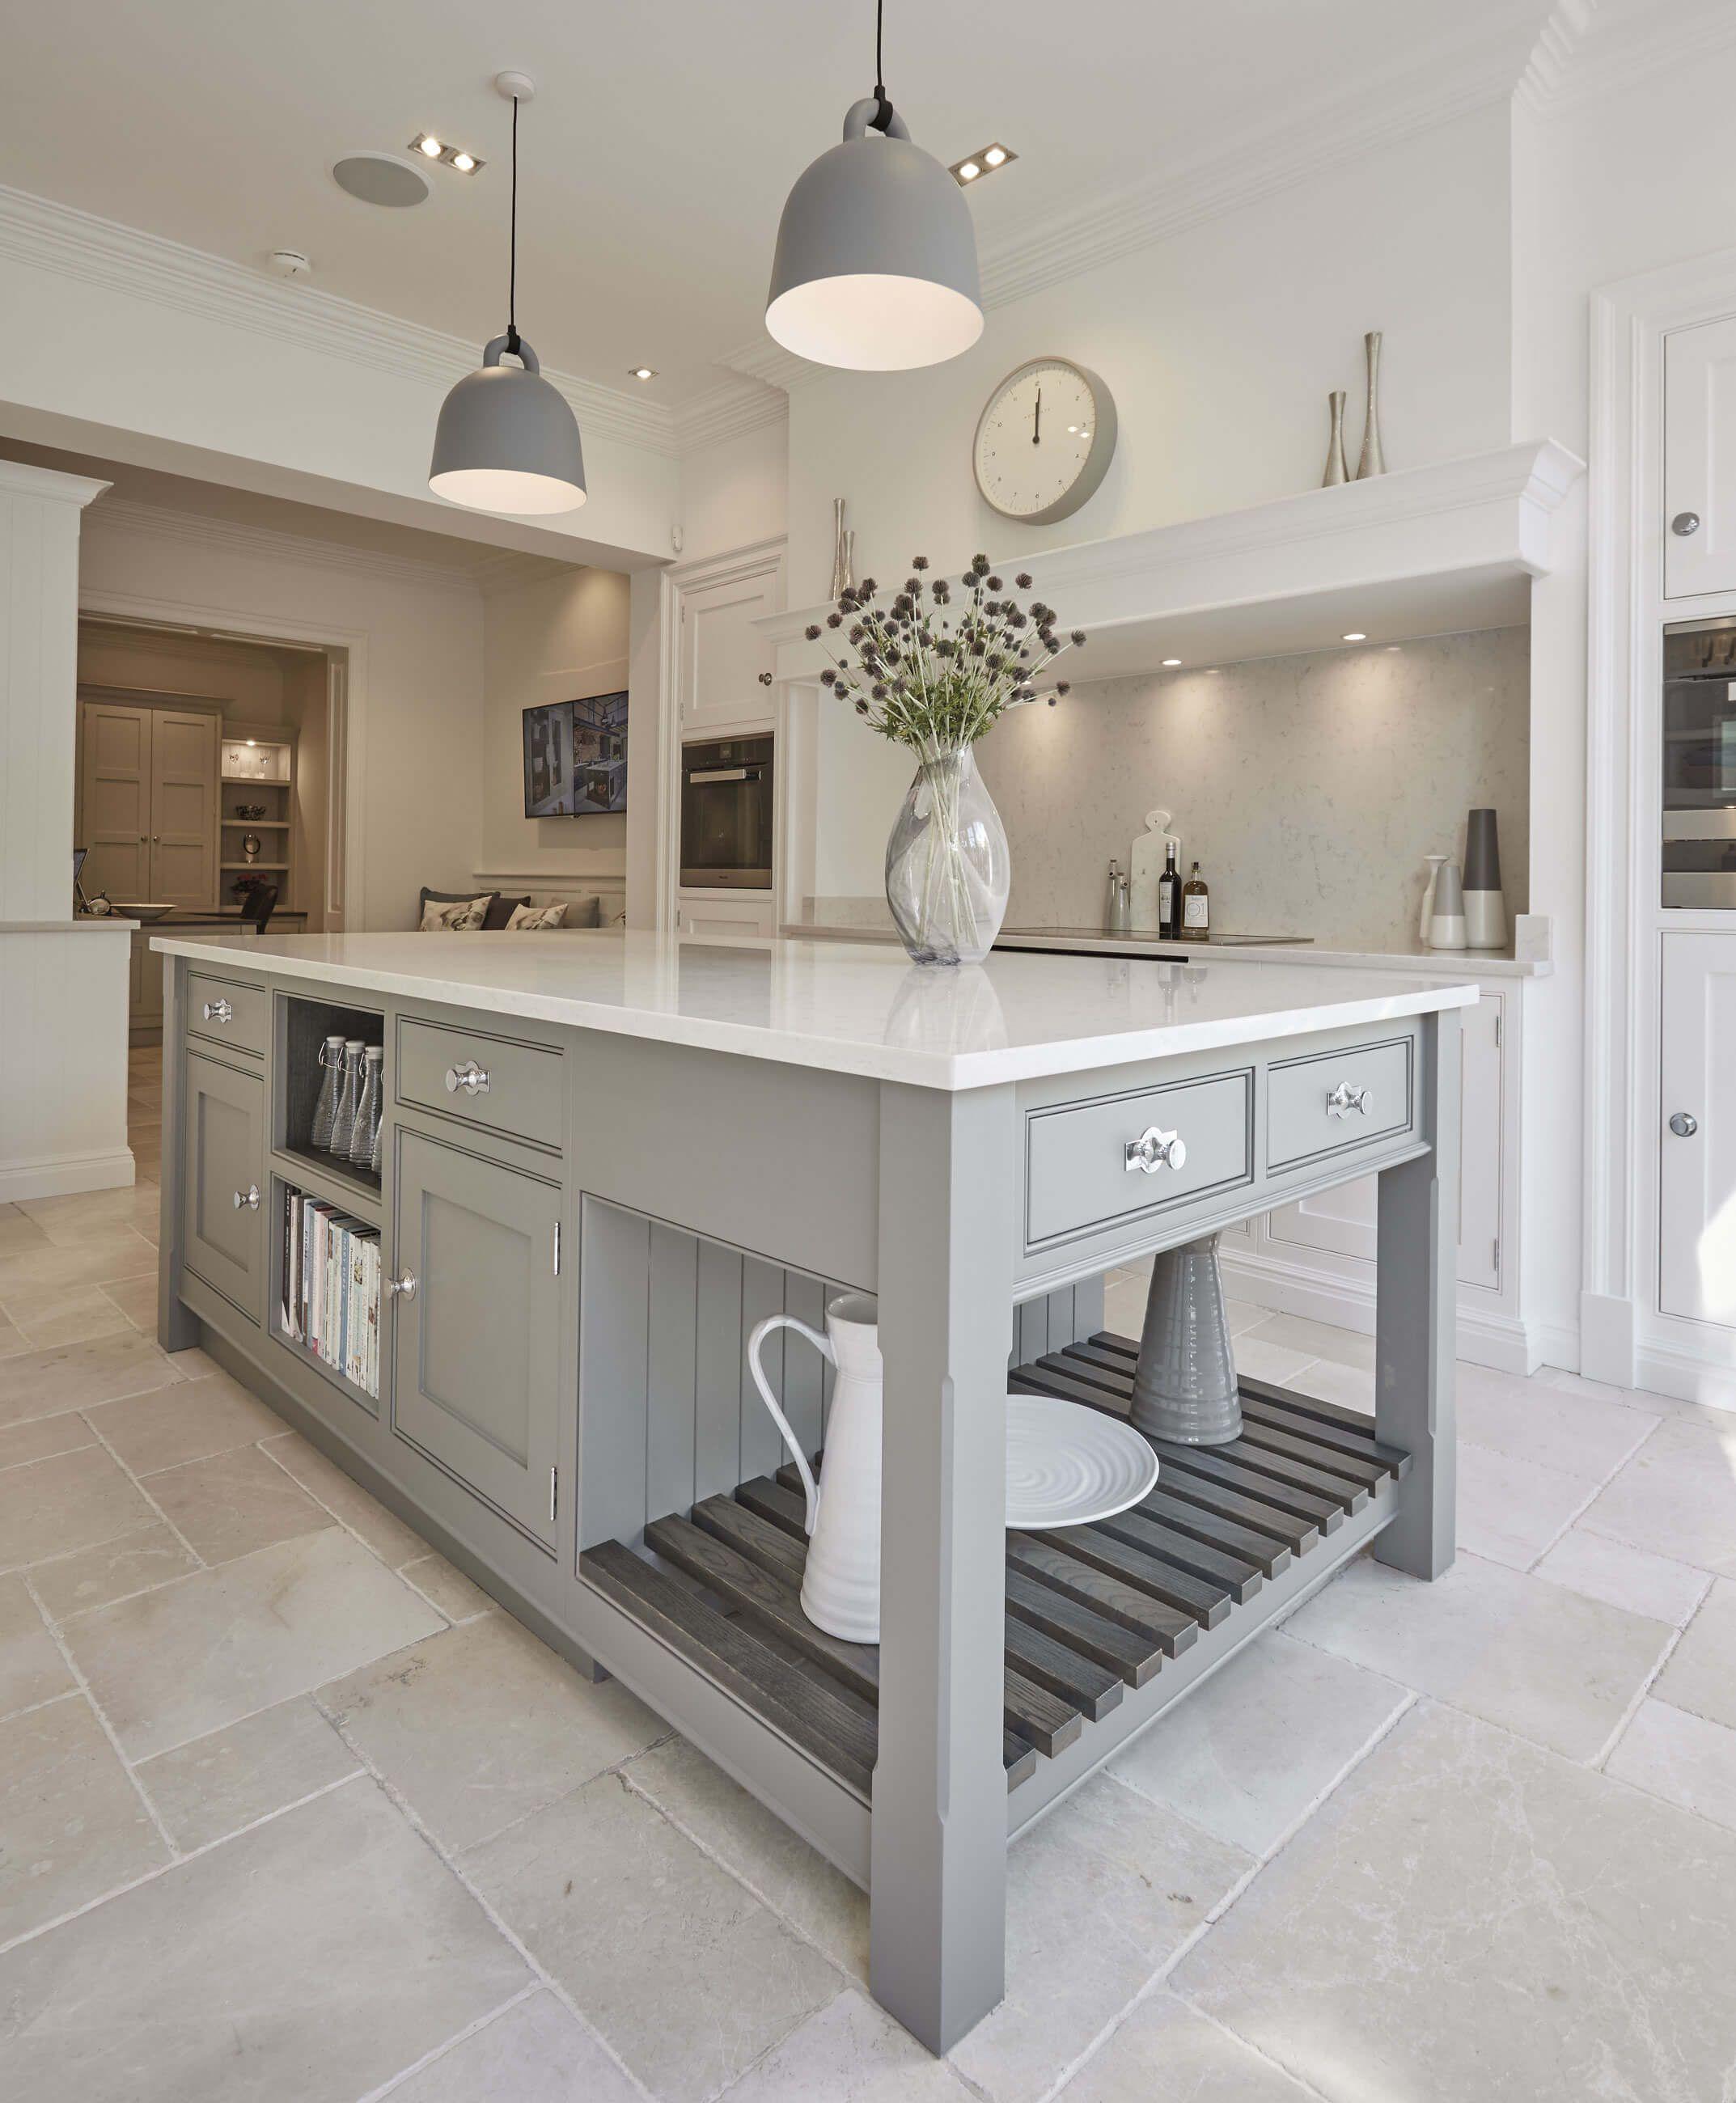 grey shaker kitchen grey shaker kitchen kitchen design home kitchens on kitchen ideas gray id=65936